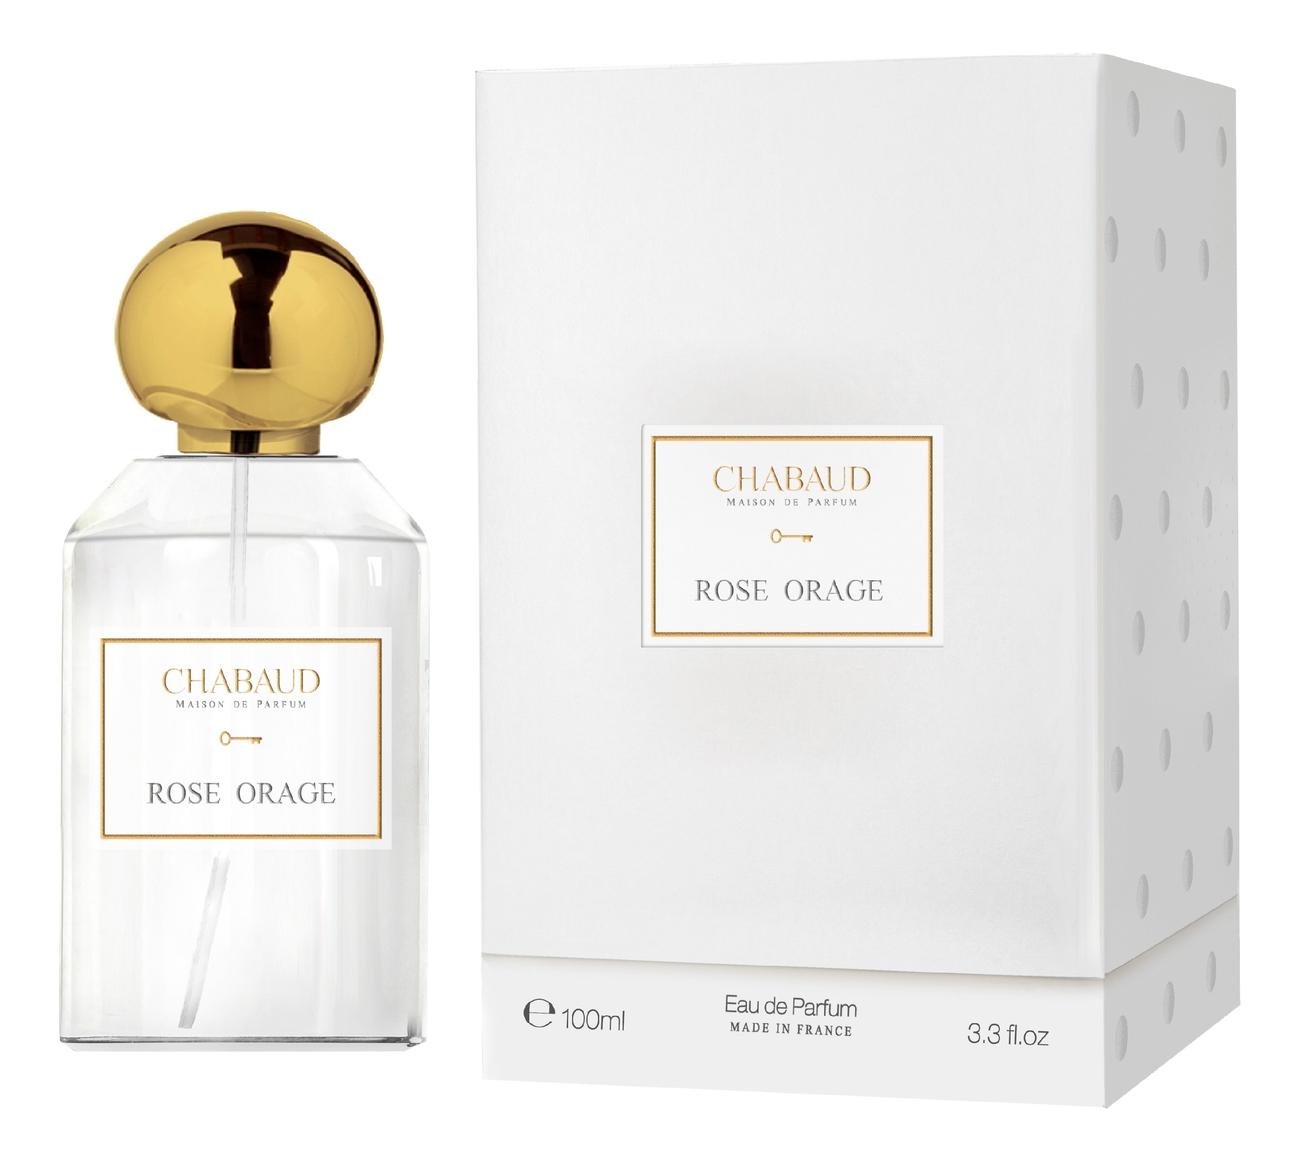 Chabaud Maison De Parfum Rose Orage: парфюмерная вода 100мл chabaud maison de parfum nectar de fleurs парфюмерная вода 100мл